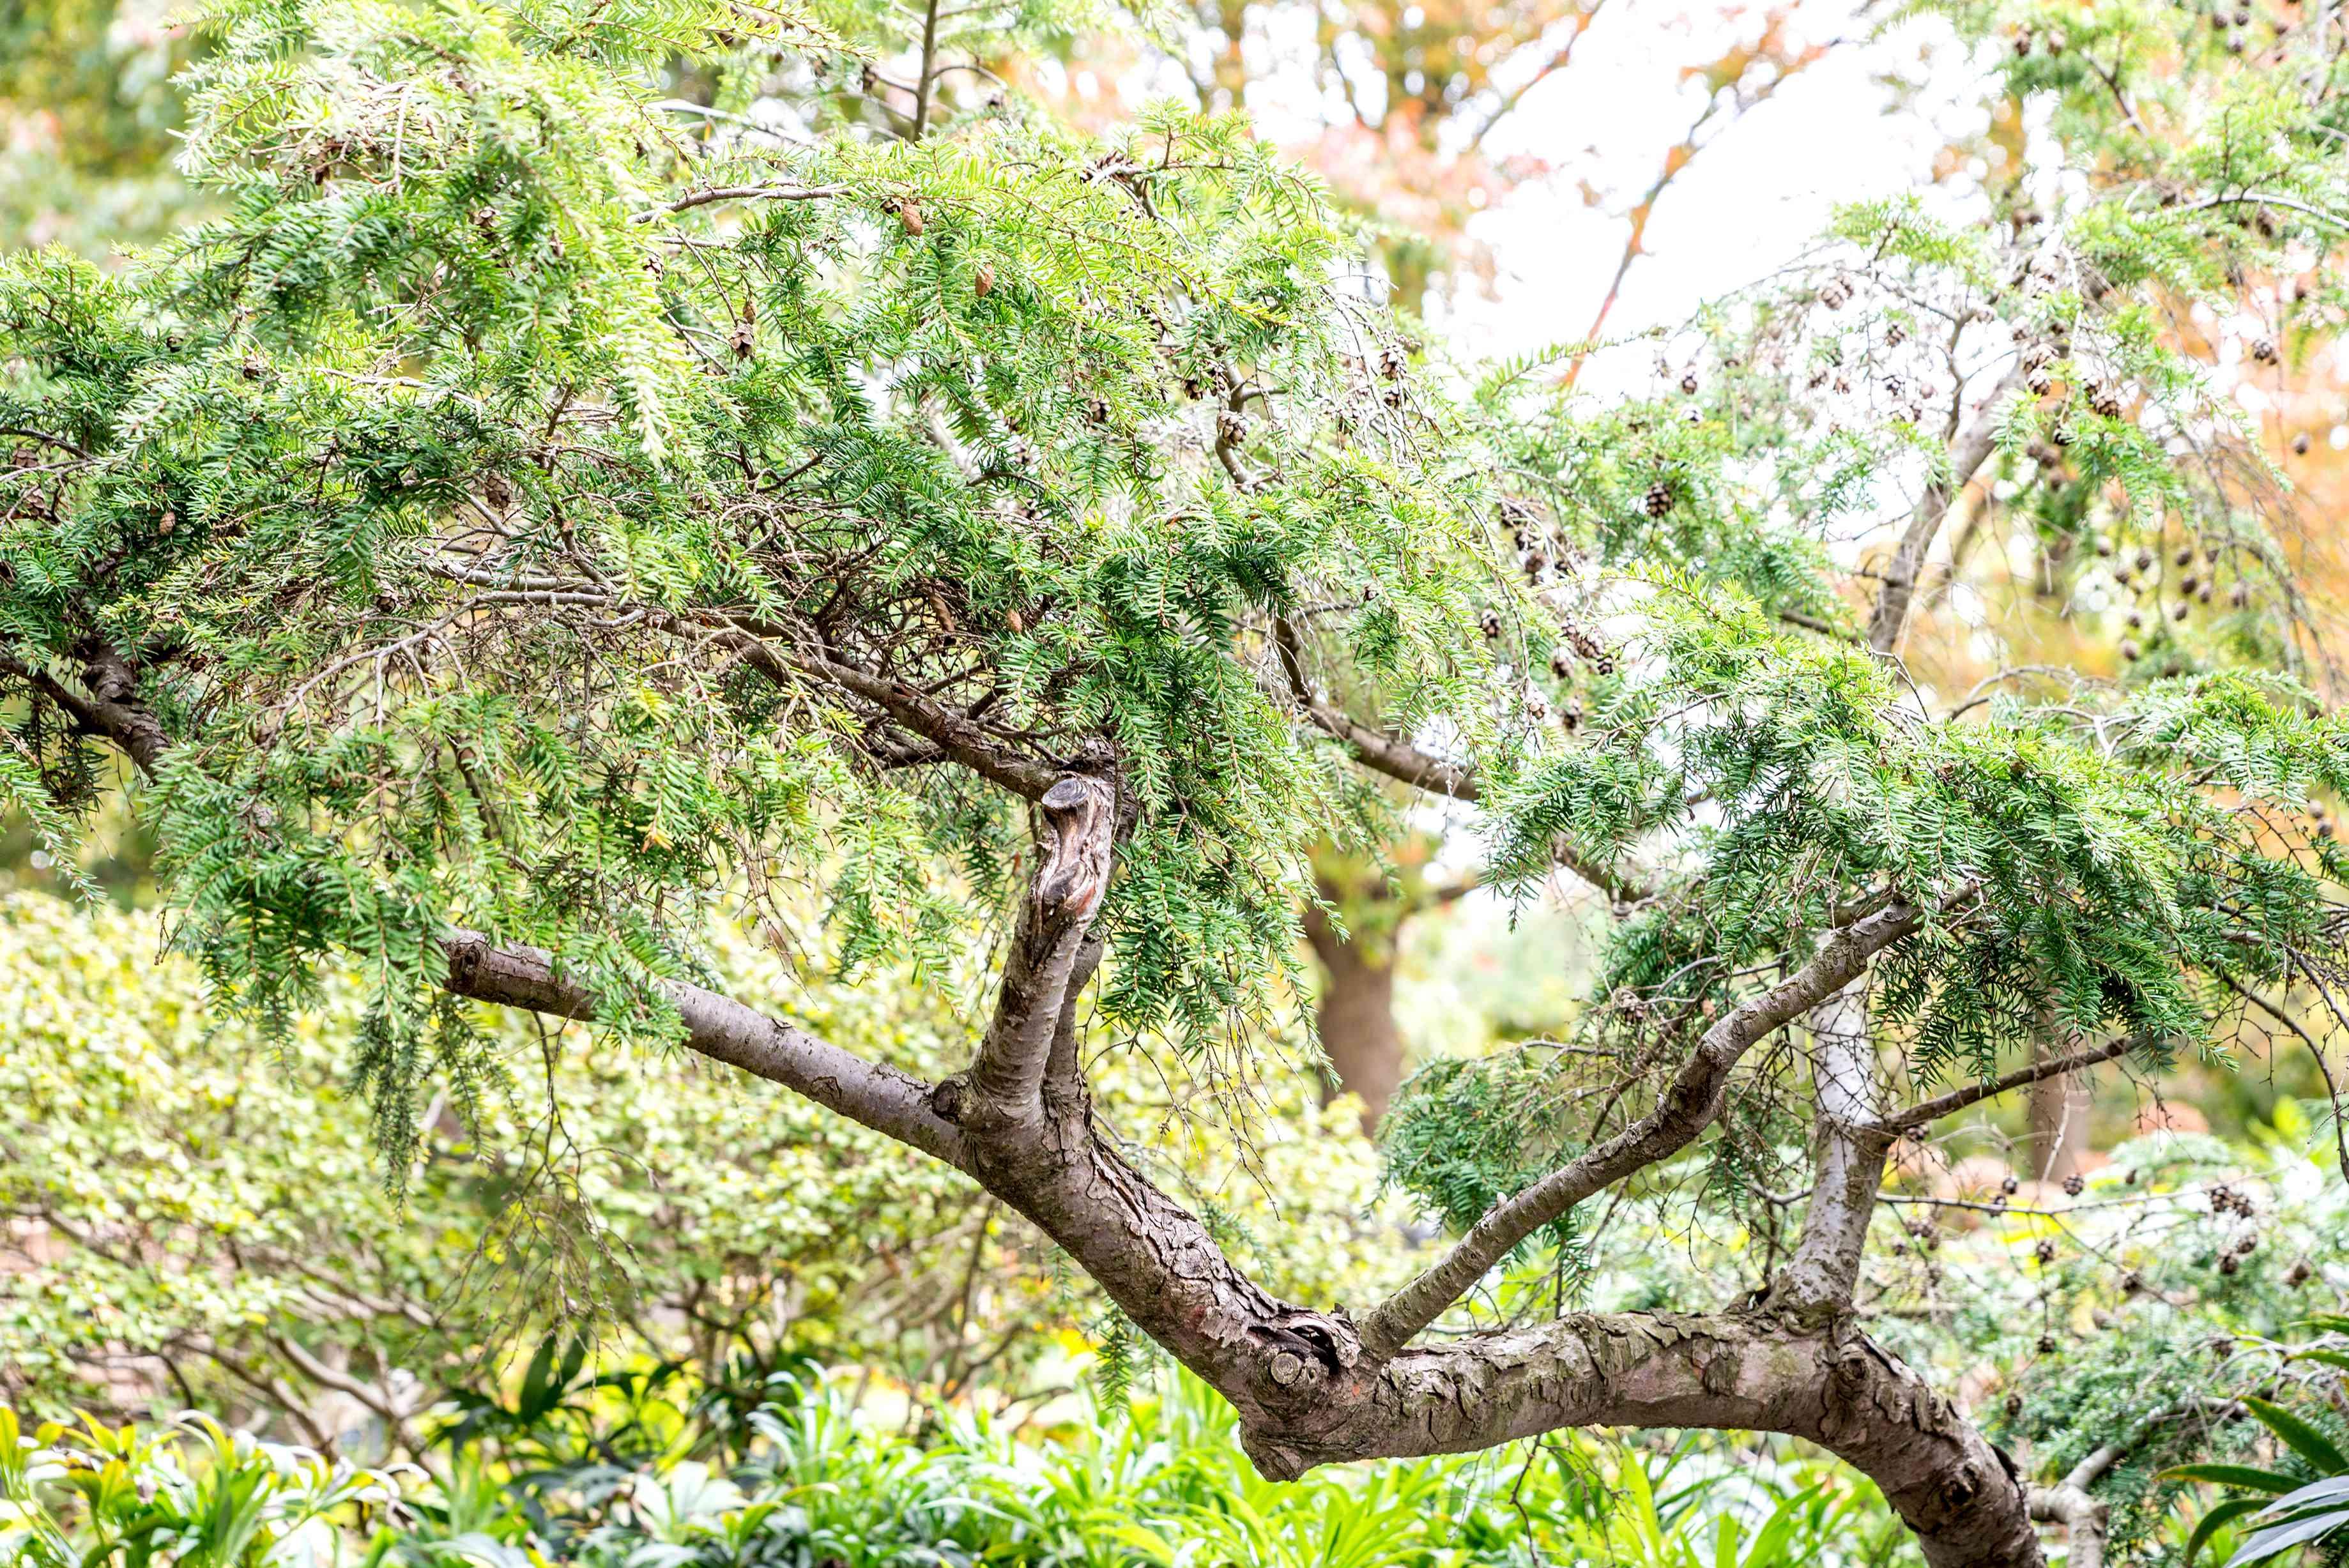 Canadian hemlock branch